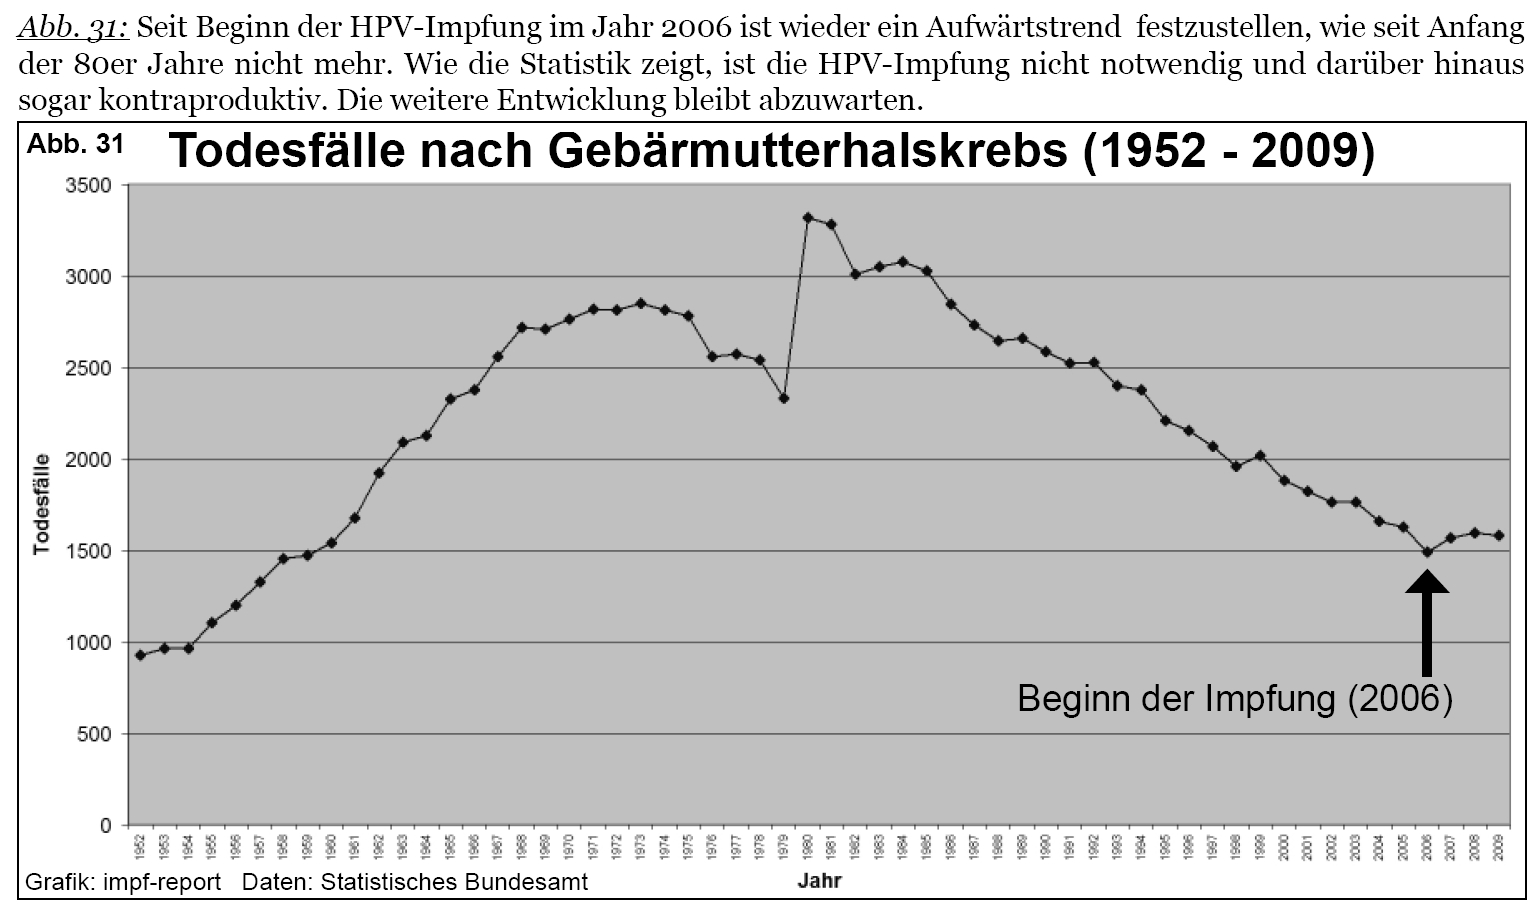 hpv impfung jungen todesfalle)